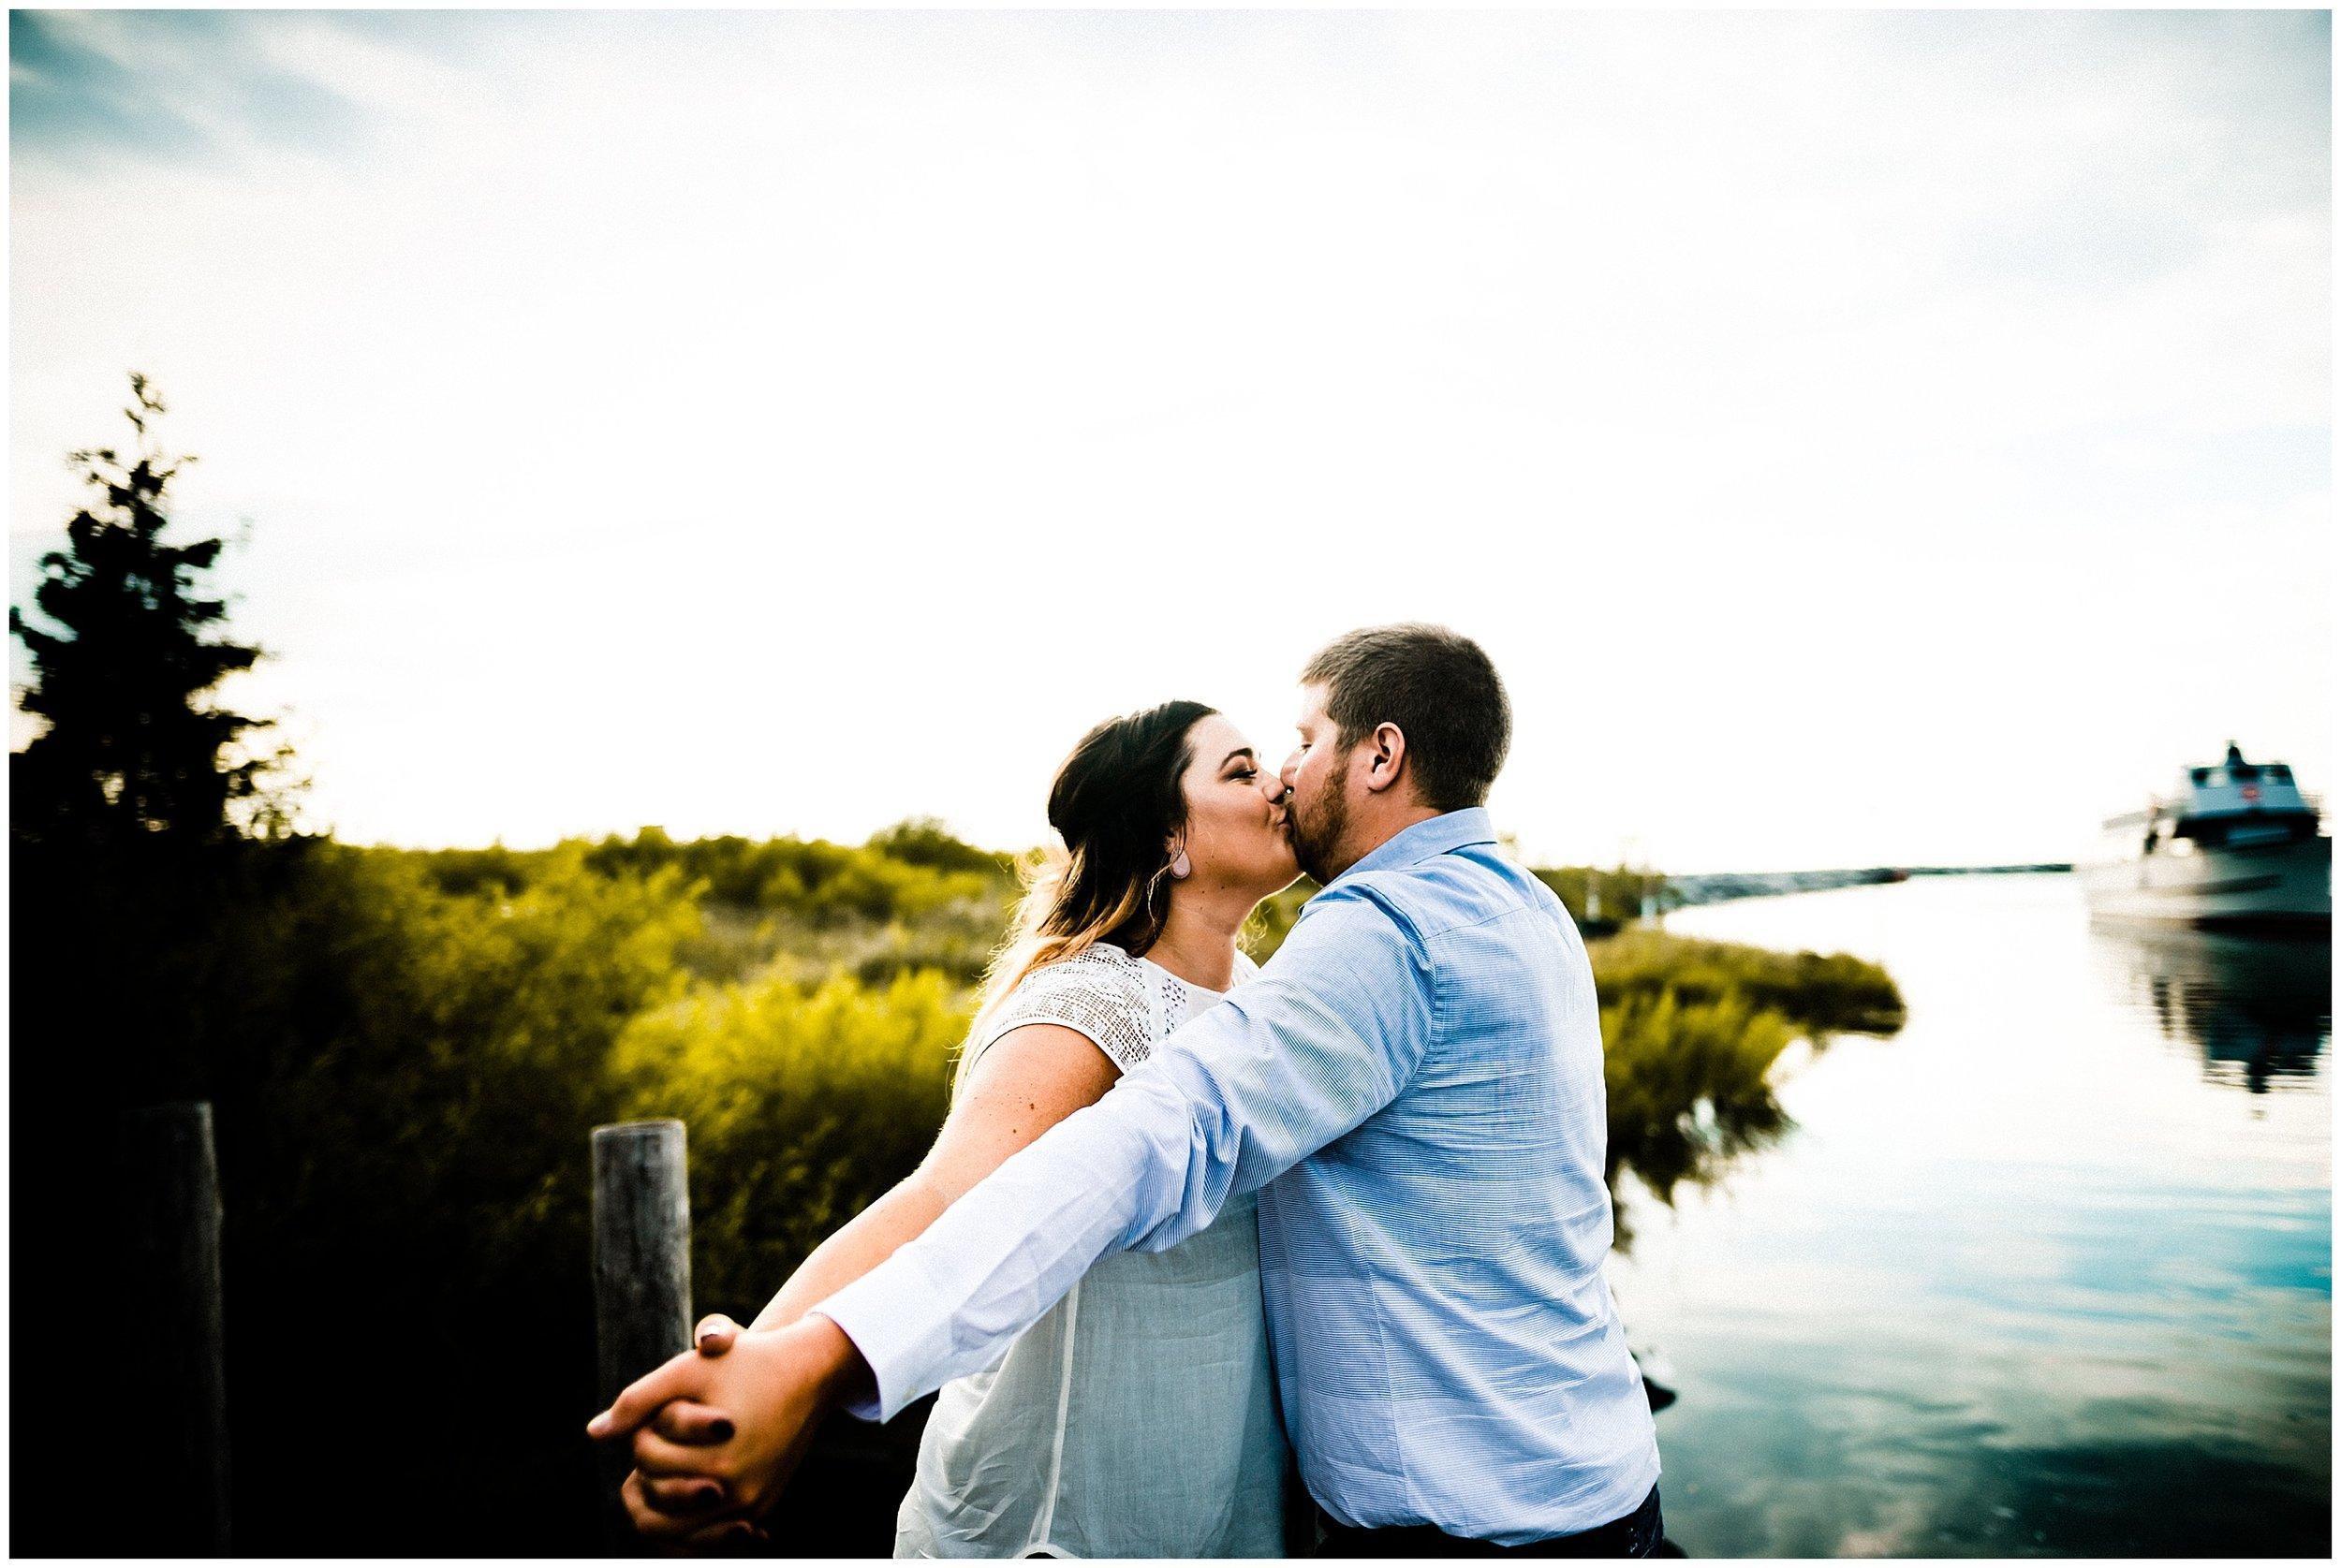 Kyle + Emily | Engaged #kyleepaigephotography_0496.jpg